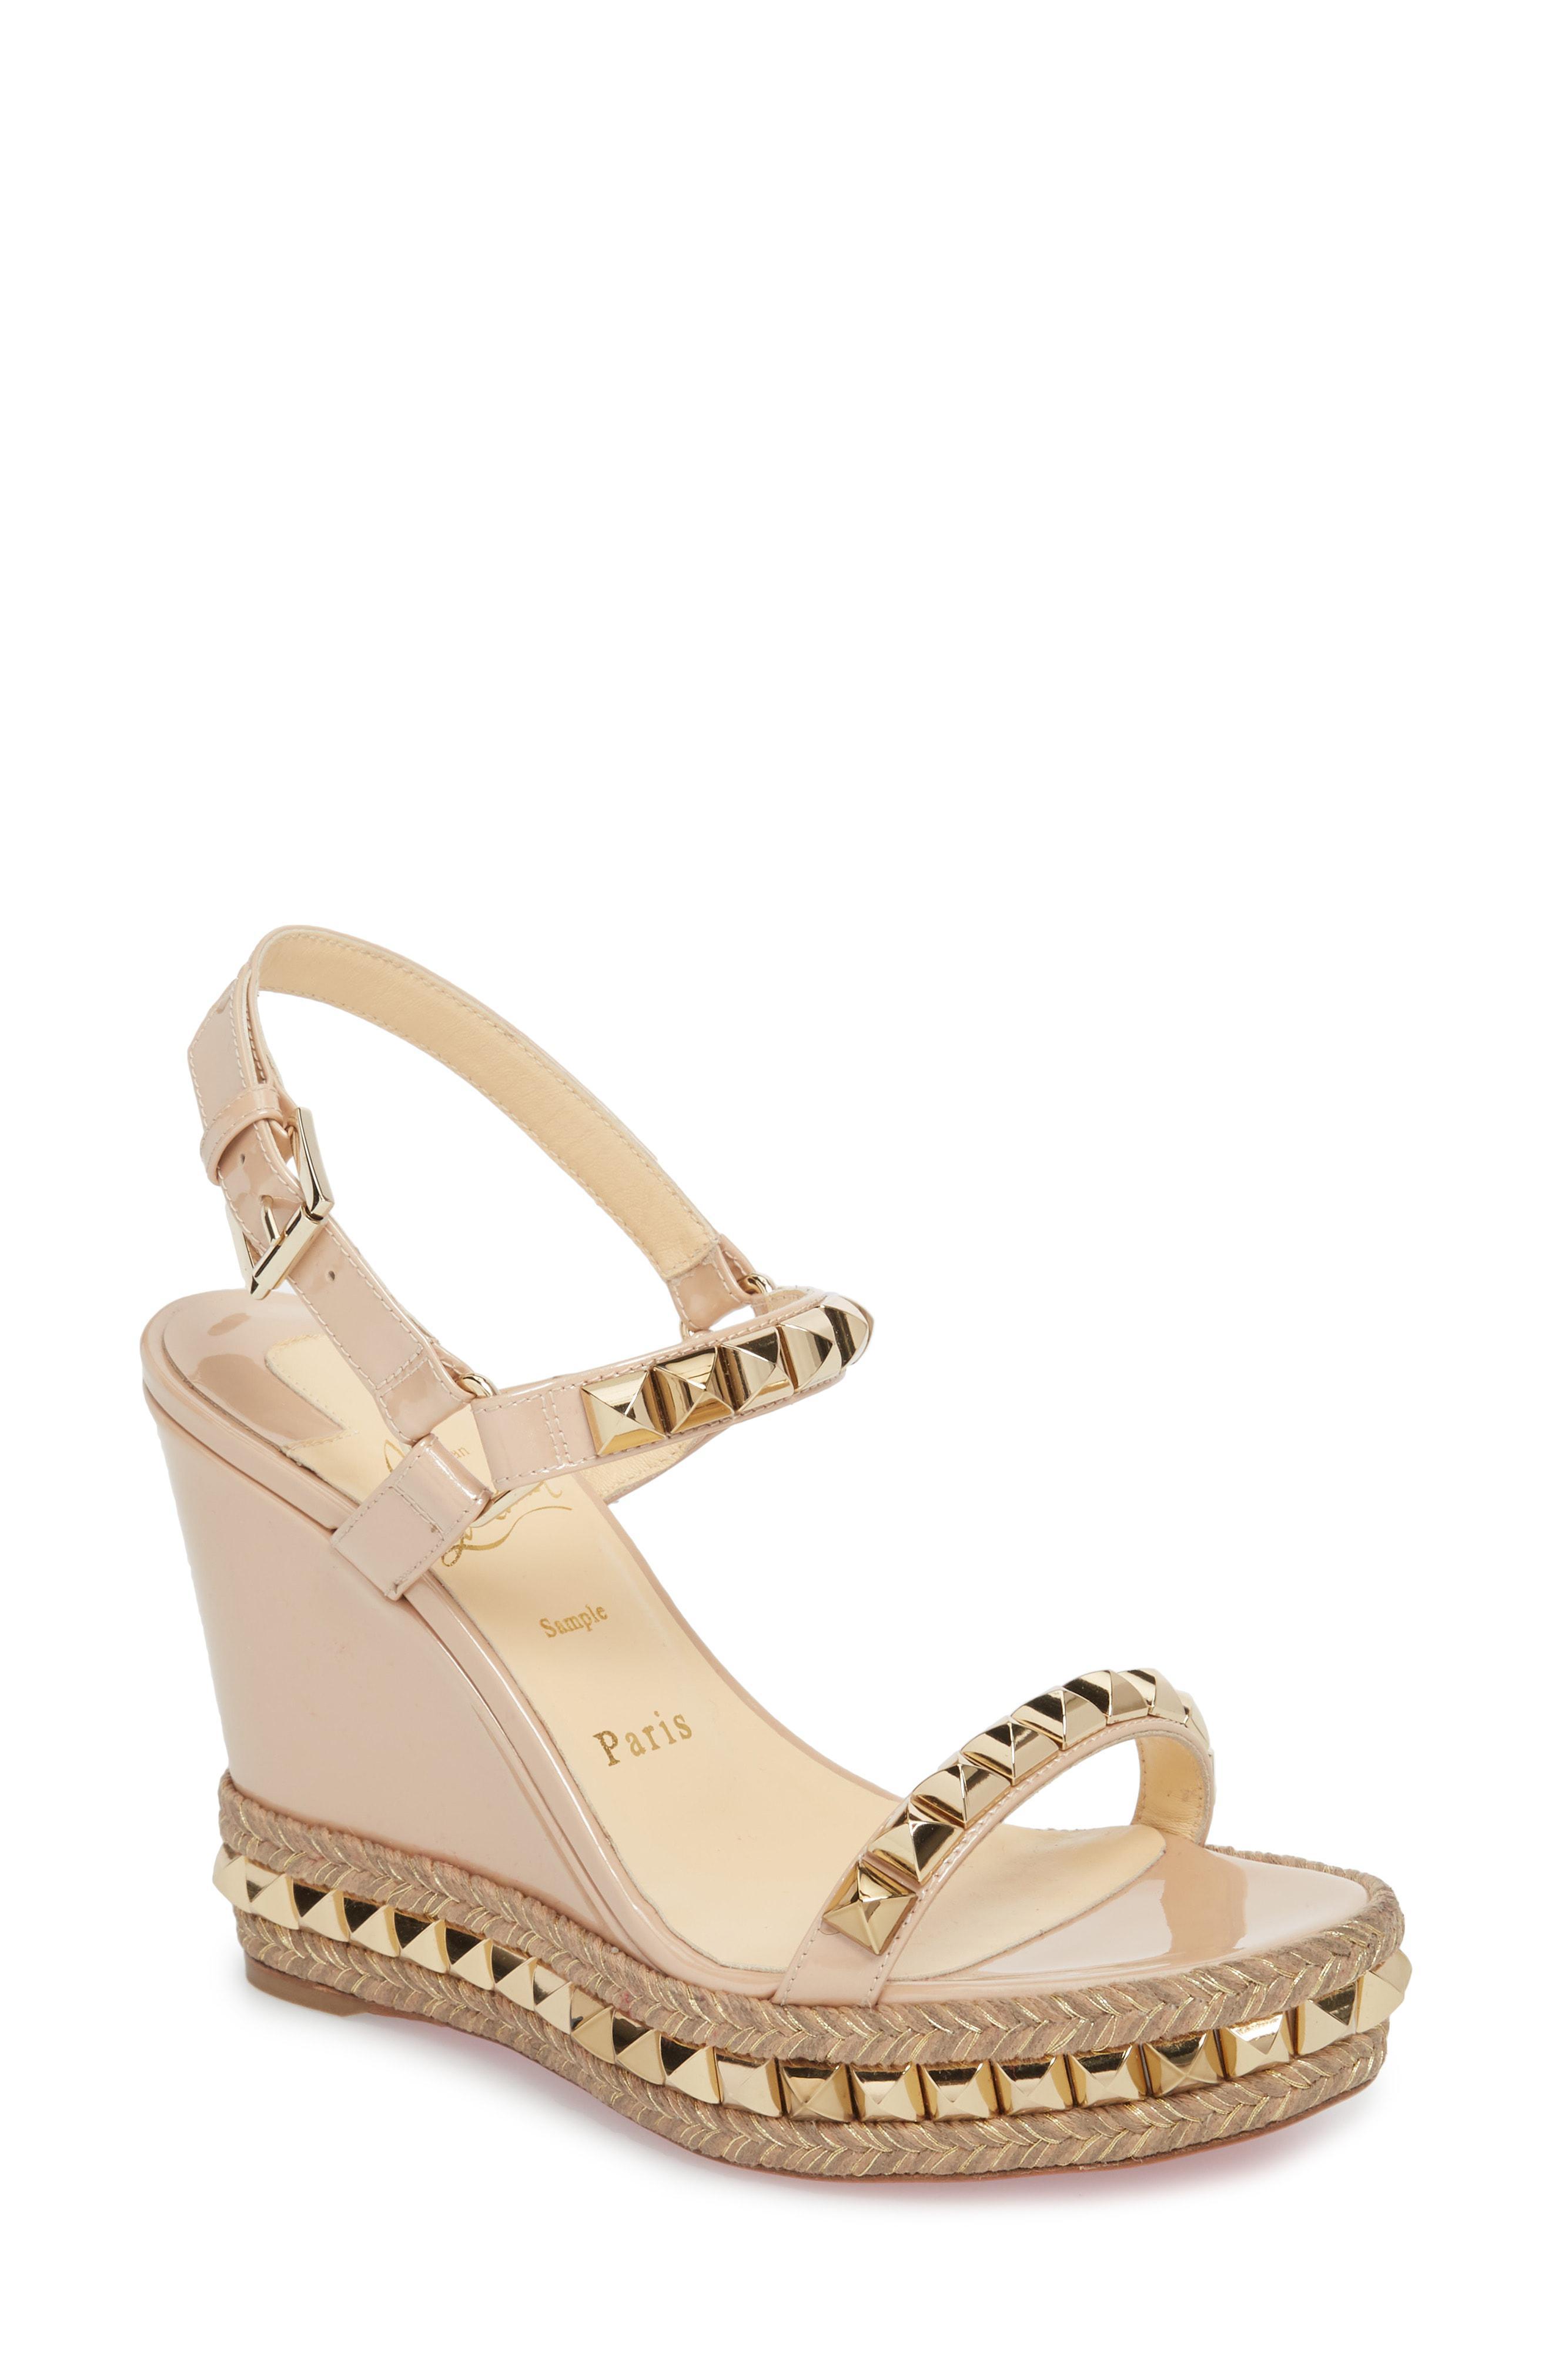 02ef418d6735 Lyst - Christian Louboutin Cataclou Espadrille Wedge Sandal in Metallic